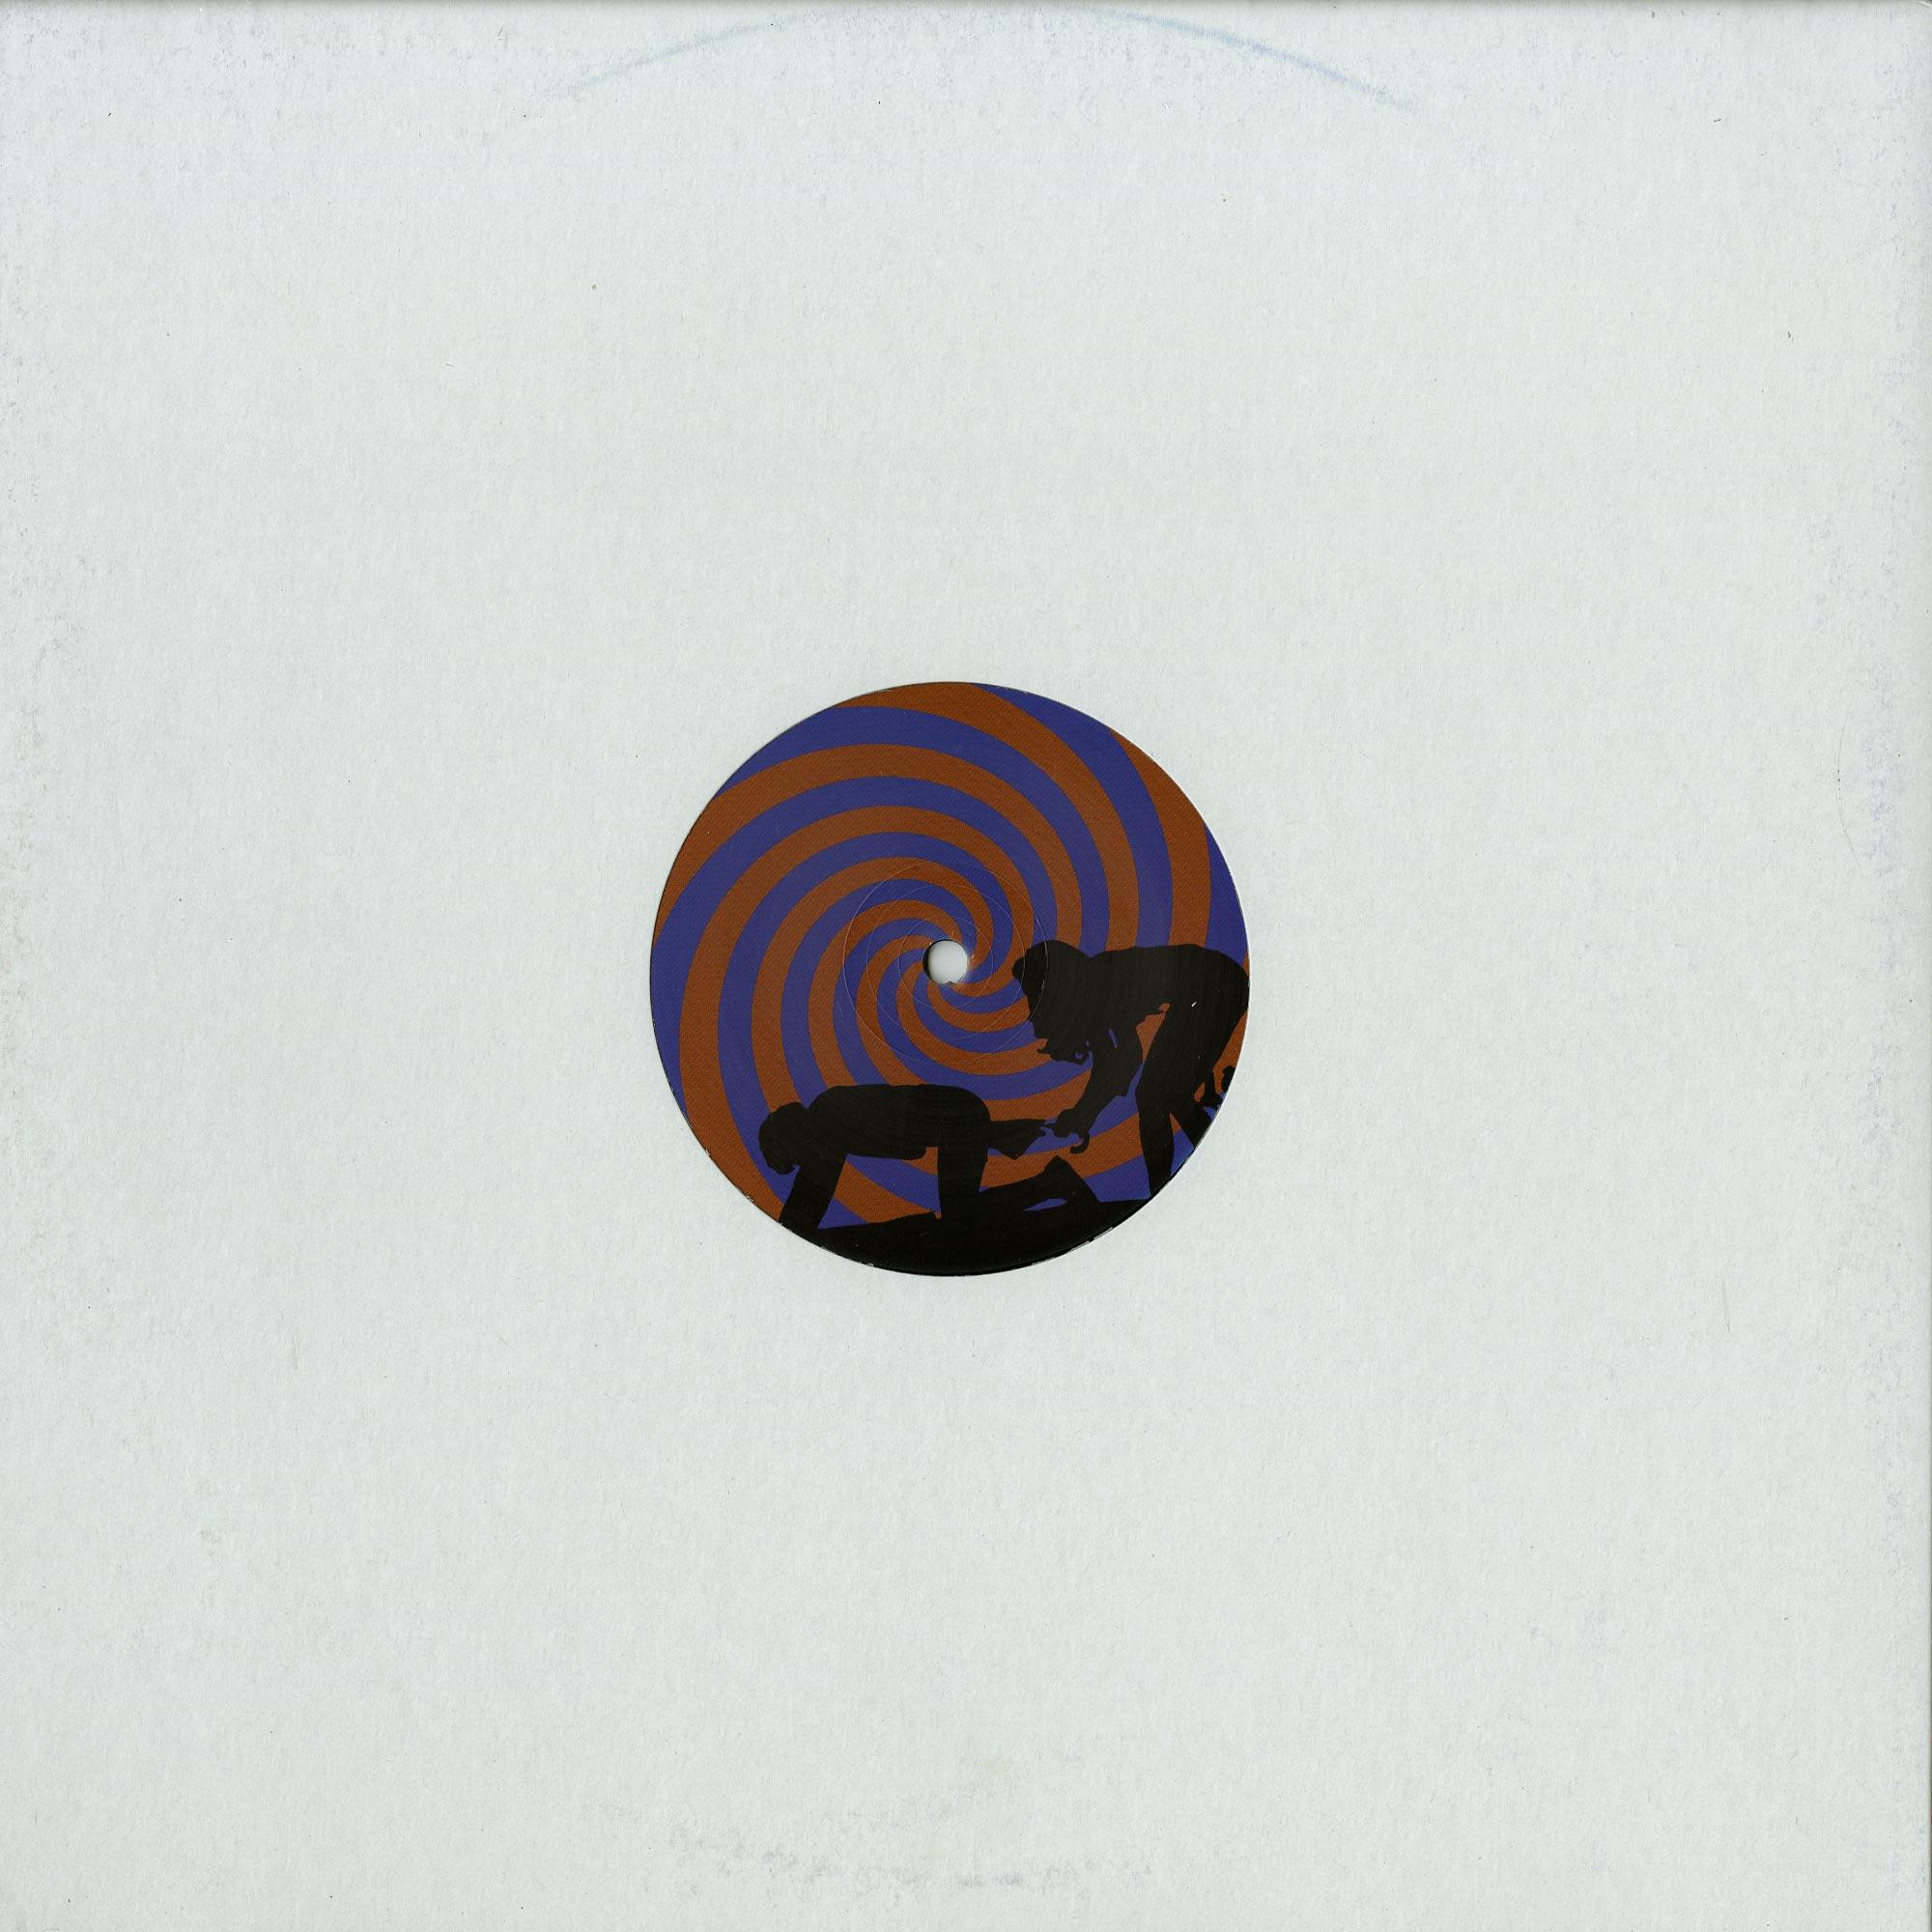 David Glass / Timmy P / Twos Tones - SHAG EDITS VOLUME 4